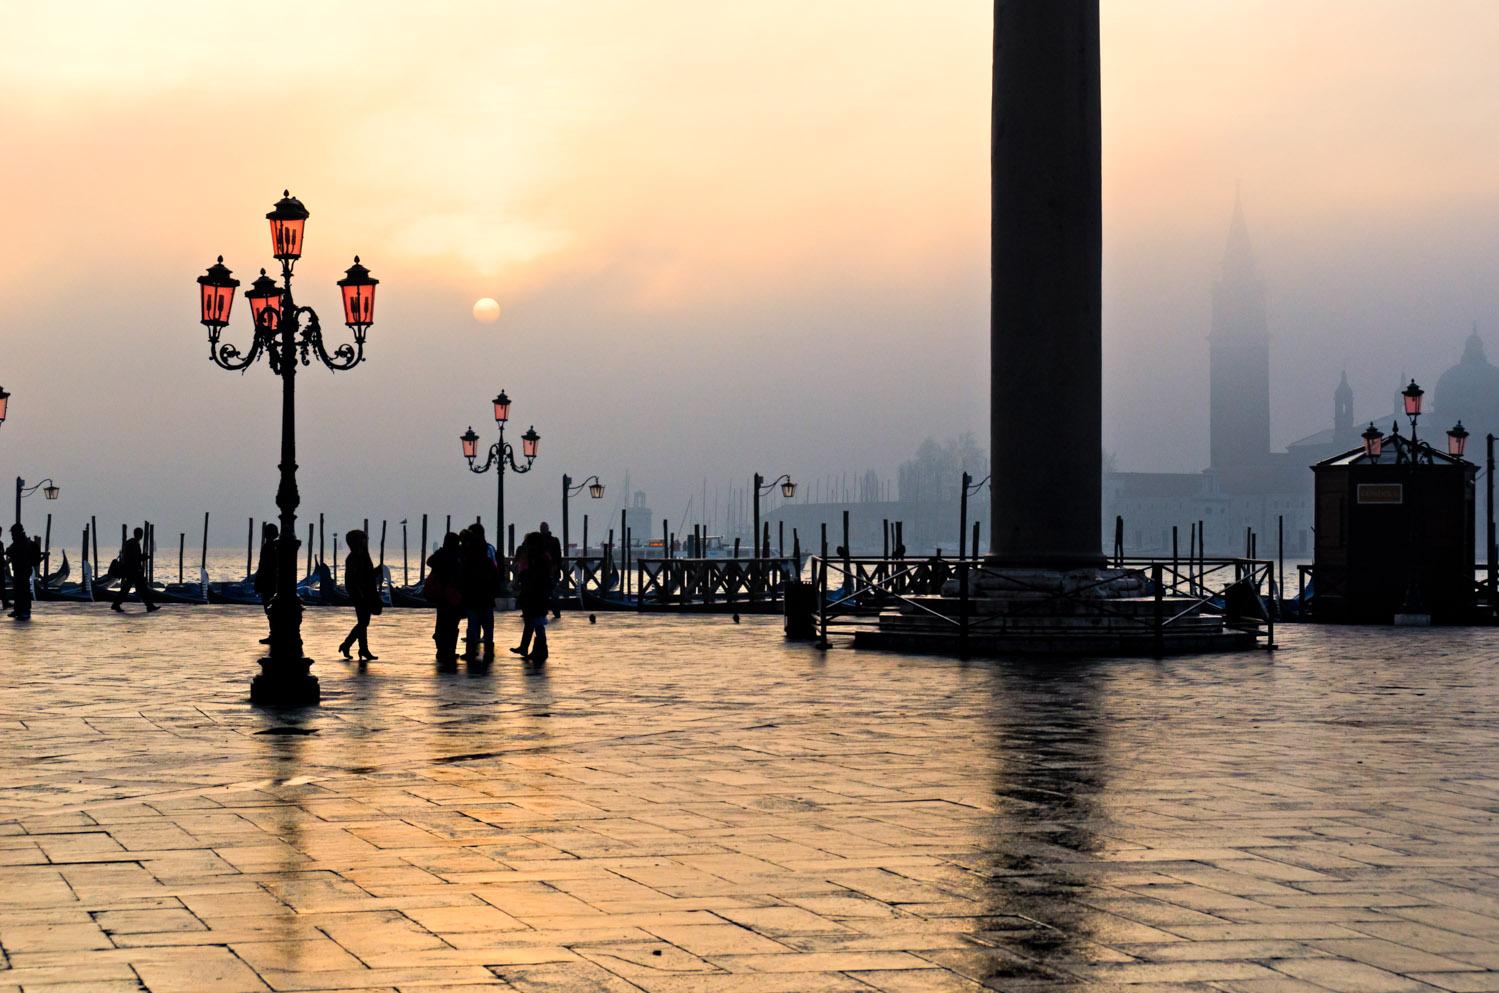 Sunrise over Fog, Piazetta San Marco